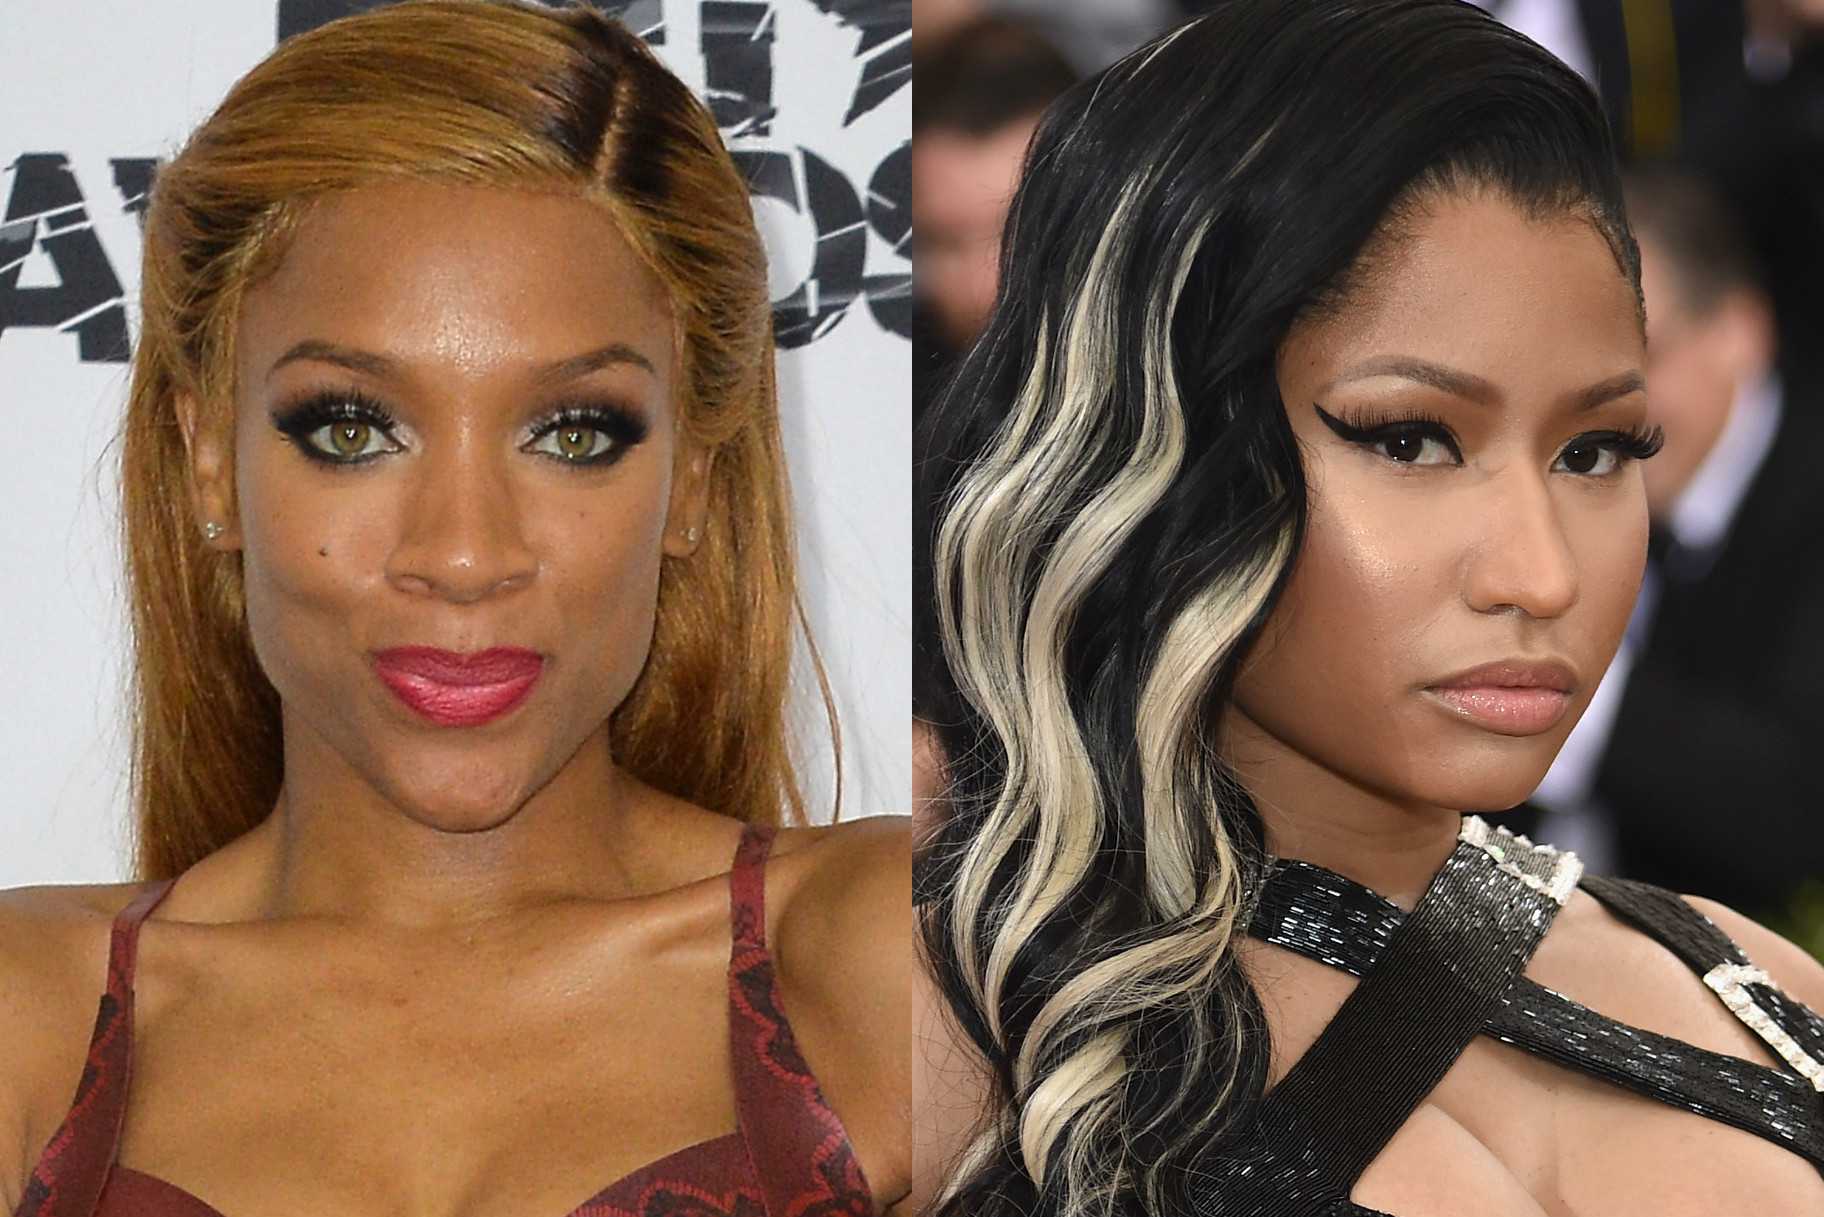 Lil Mama Just Threw Shade At Nicki Minaj And Brought Lil